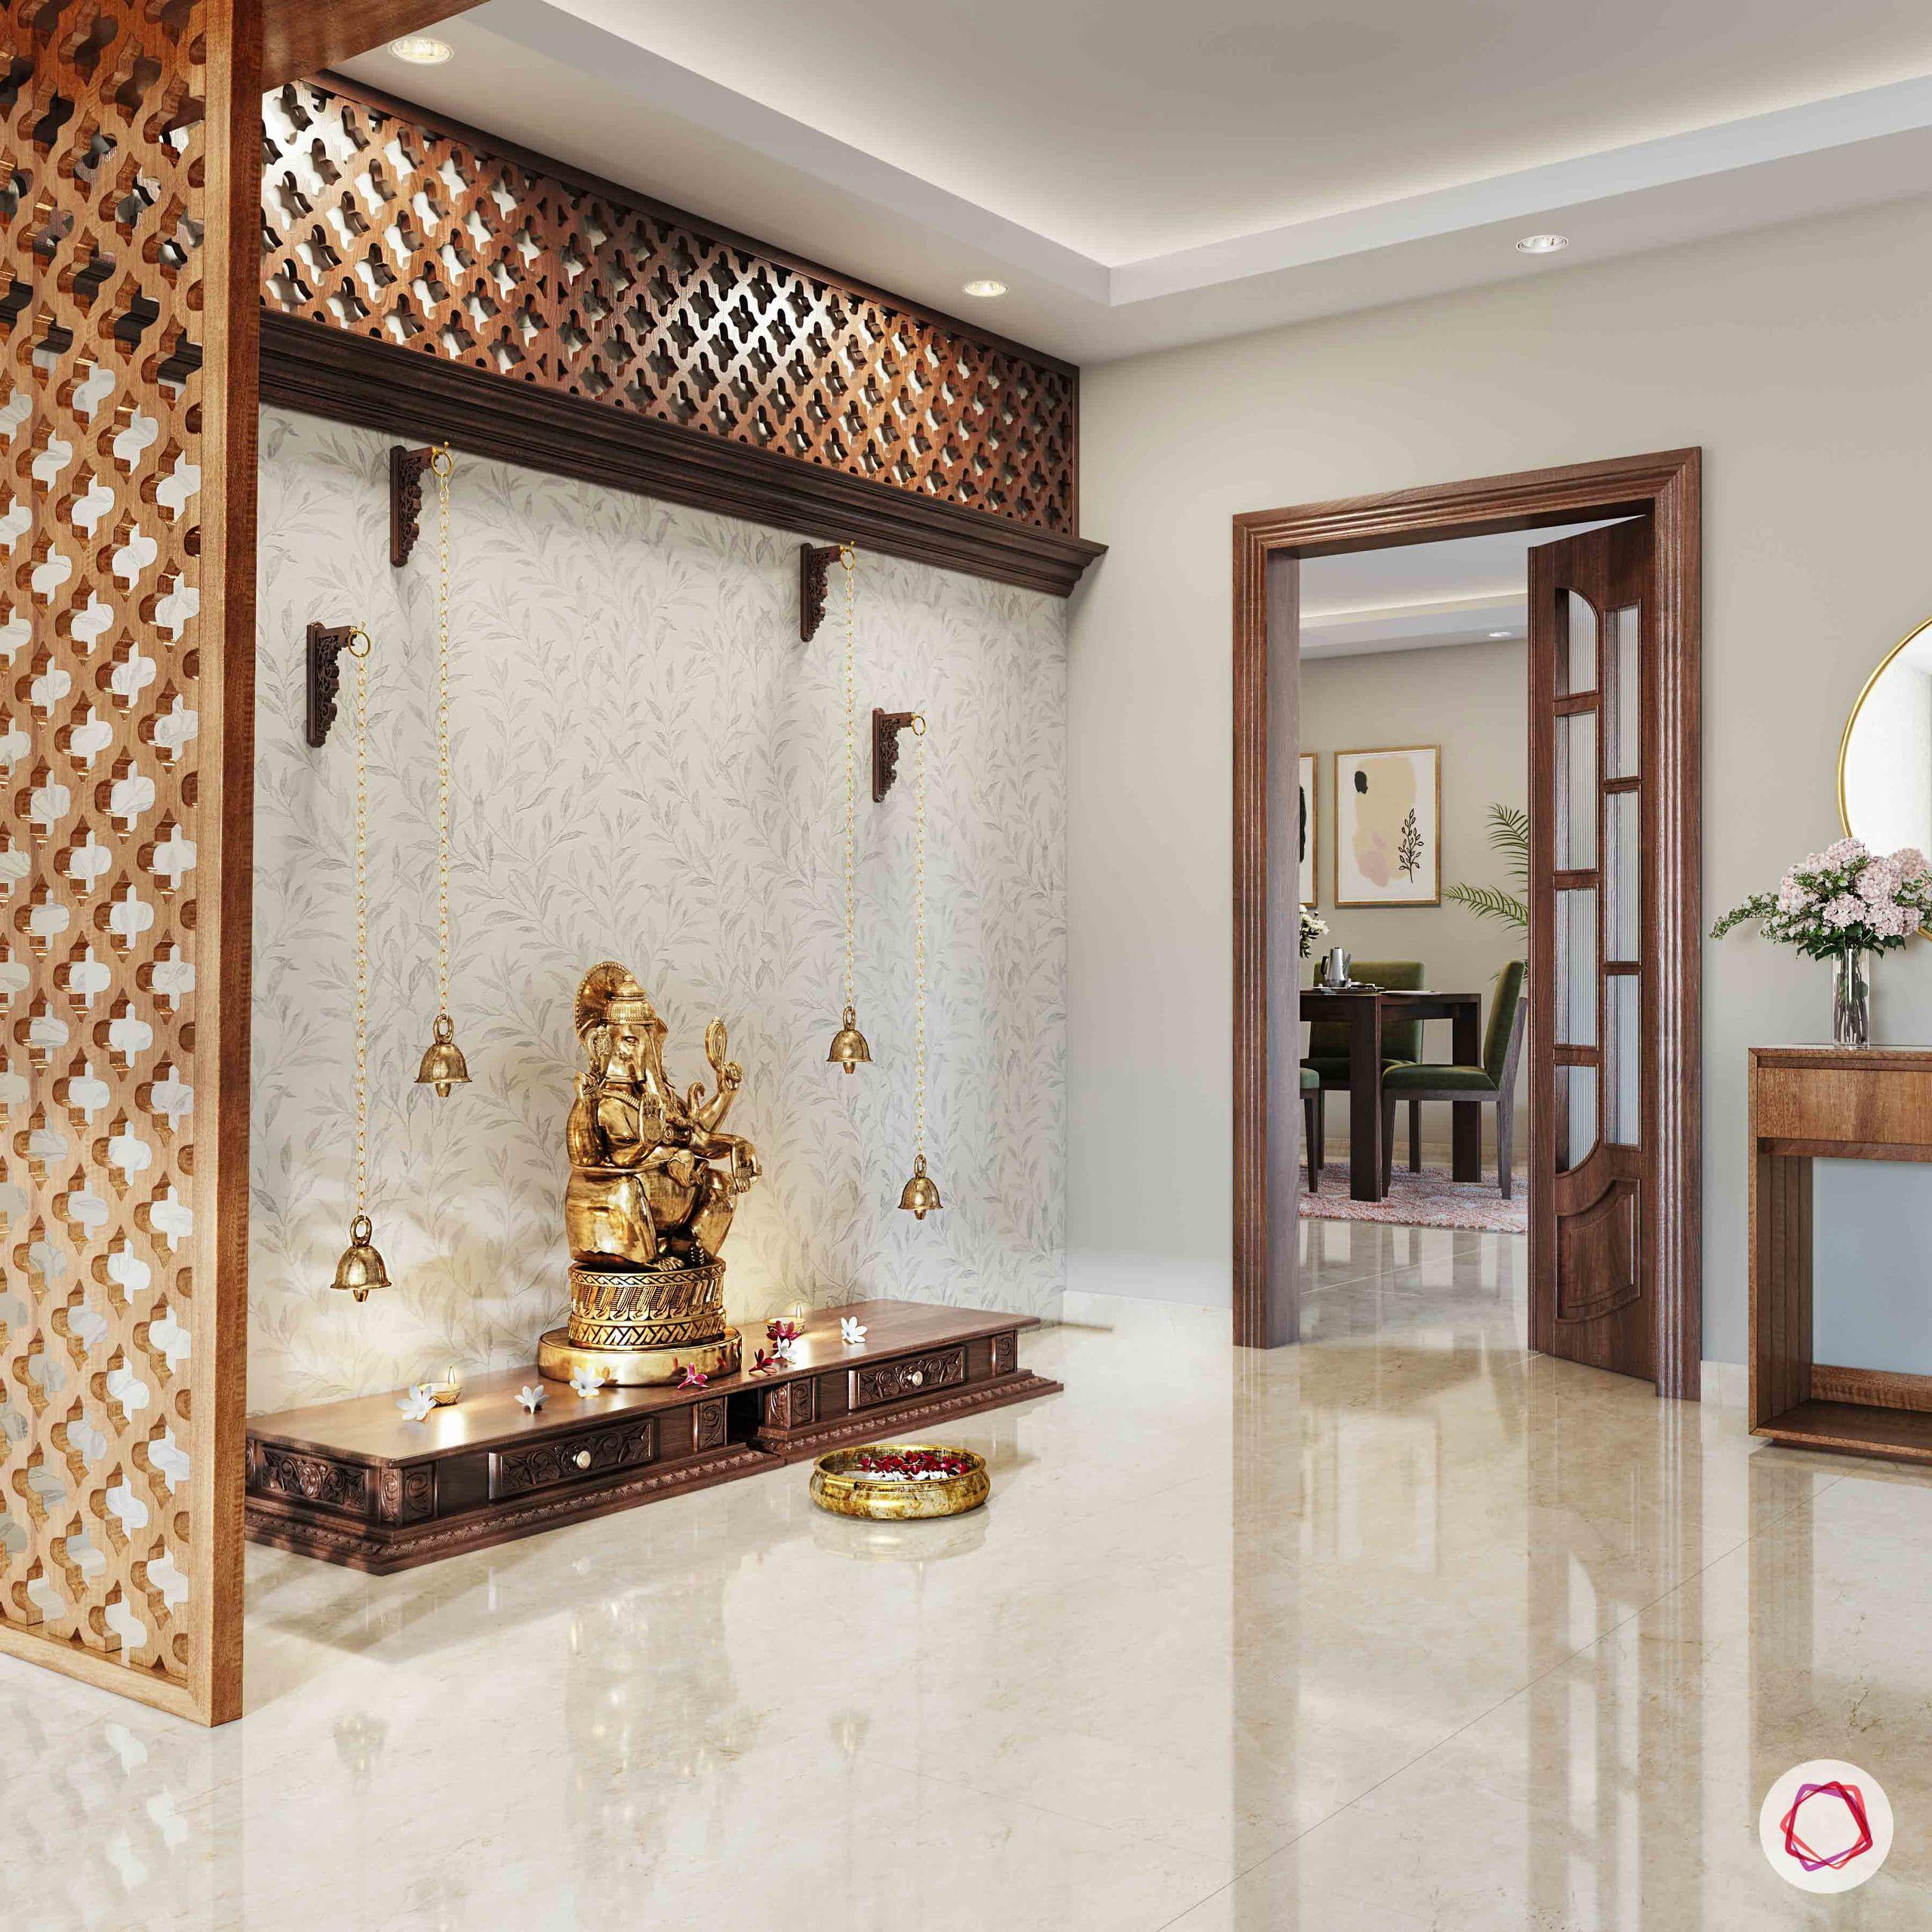 Simple Pooja Mandir Designs For Walls Jaali Interior Design Ideas Pooja Room Door Design Pooja Room Design Temple Design For Home